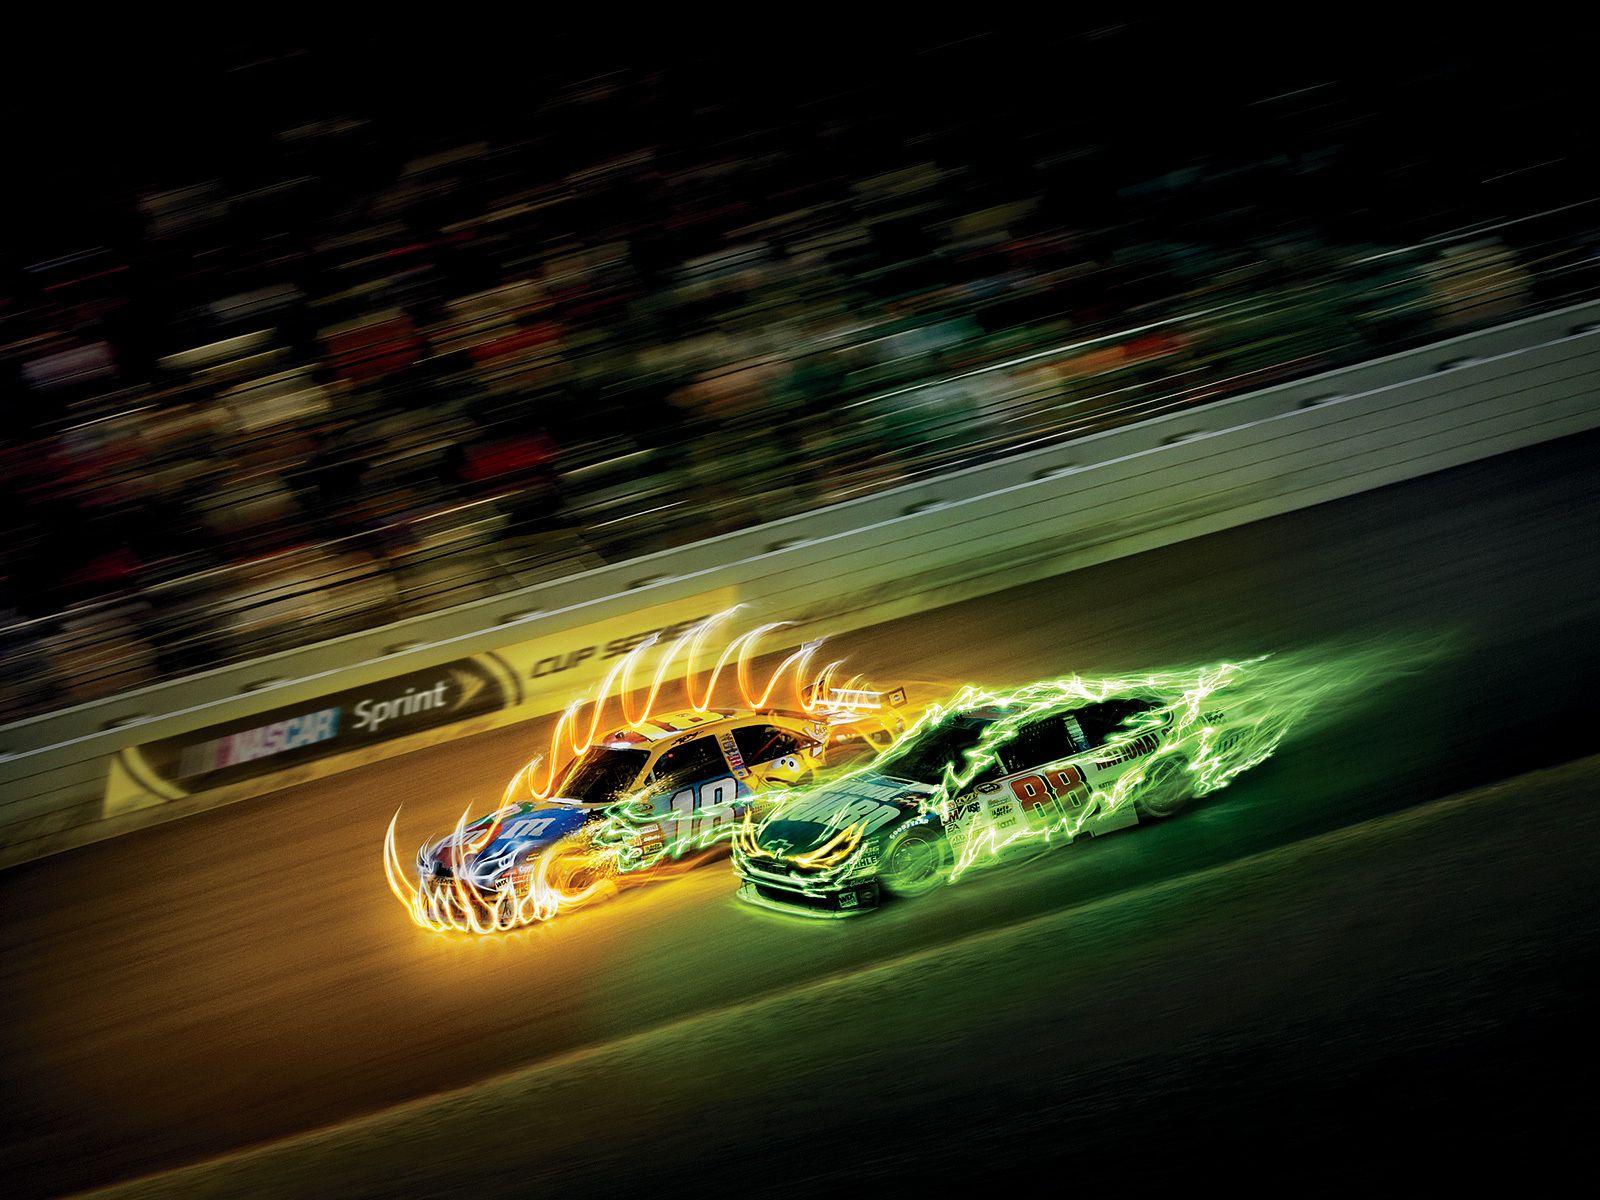 Hd Nascar Wallpapers Auto Sports Hd Car Wallpapers Nascar Nascar Racing Racing